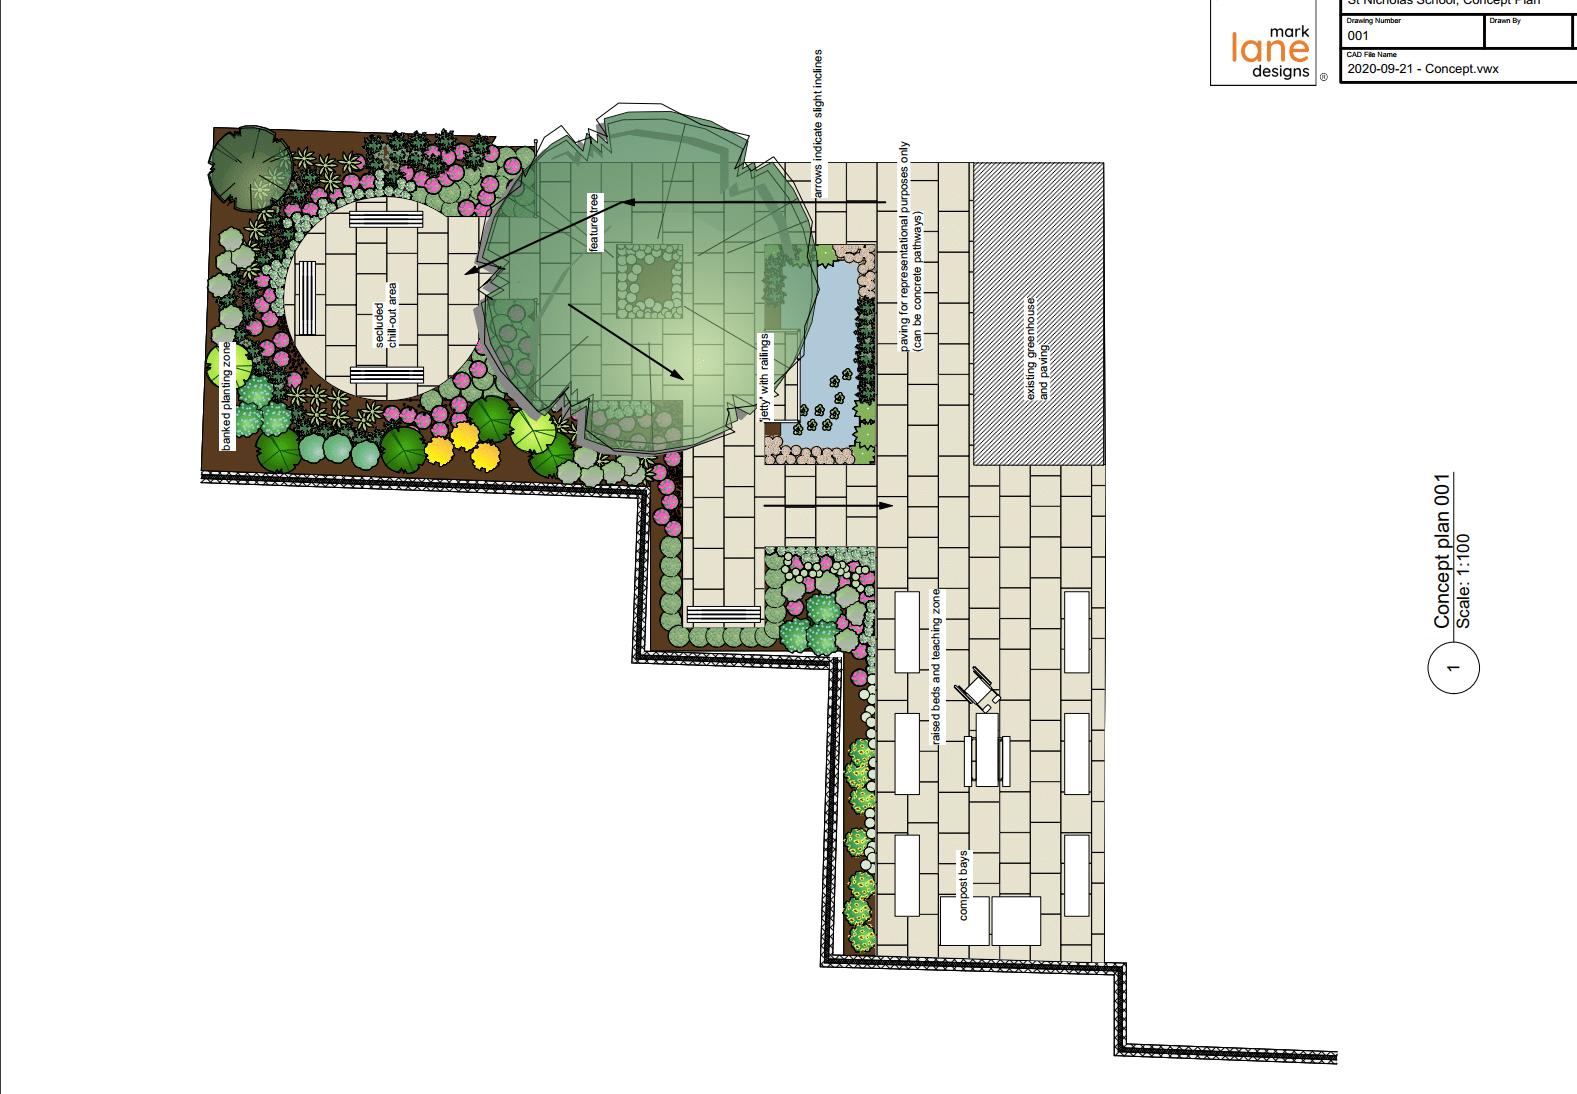 School Garden, Canterbury, Kent: Mark Lane Designs